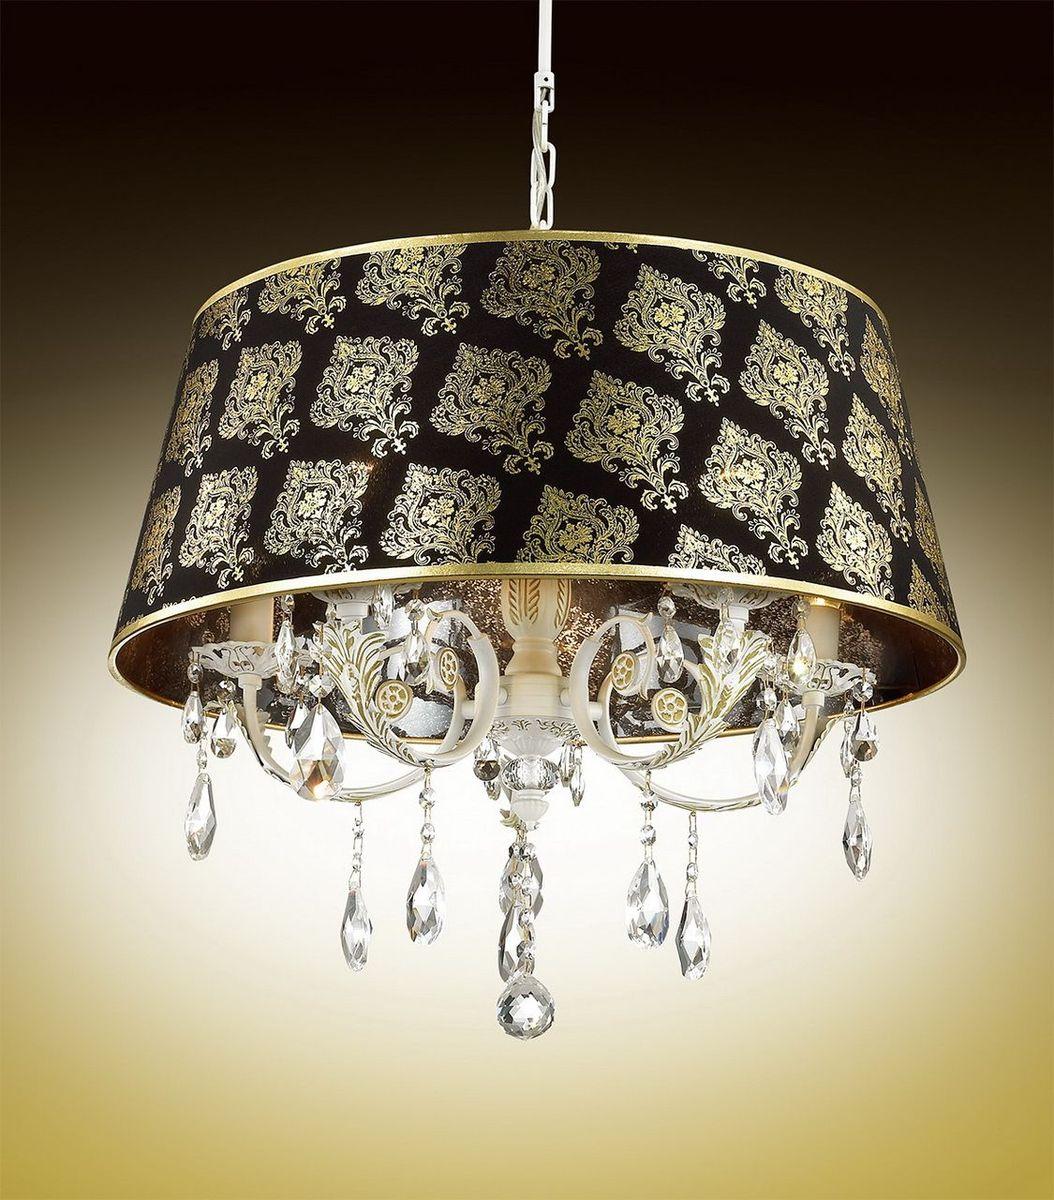 Люстра подвесная Odeon Light Tivola, 5 х E14, 40W. 2914/52914/5